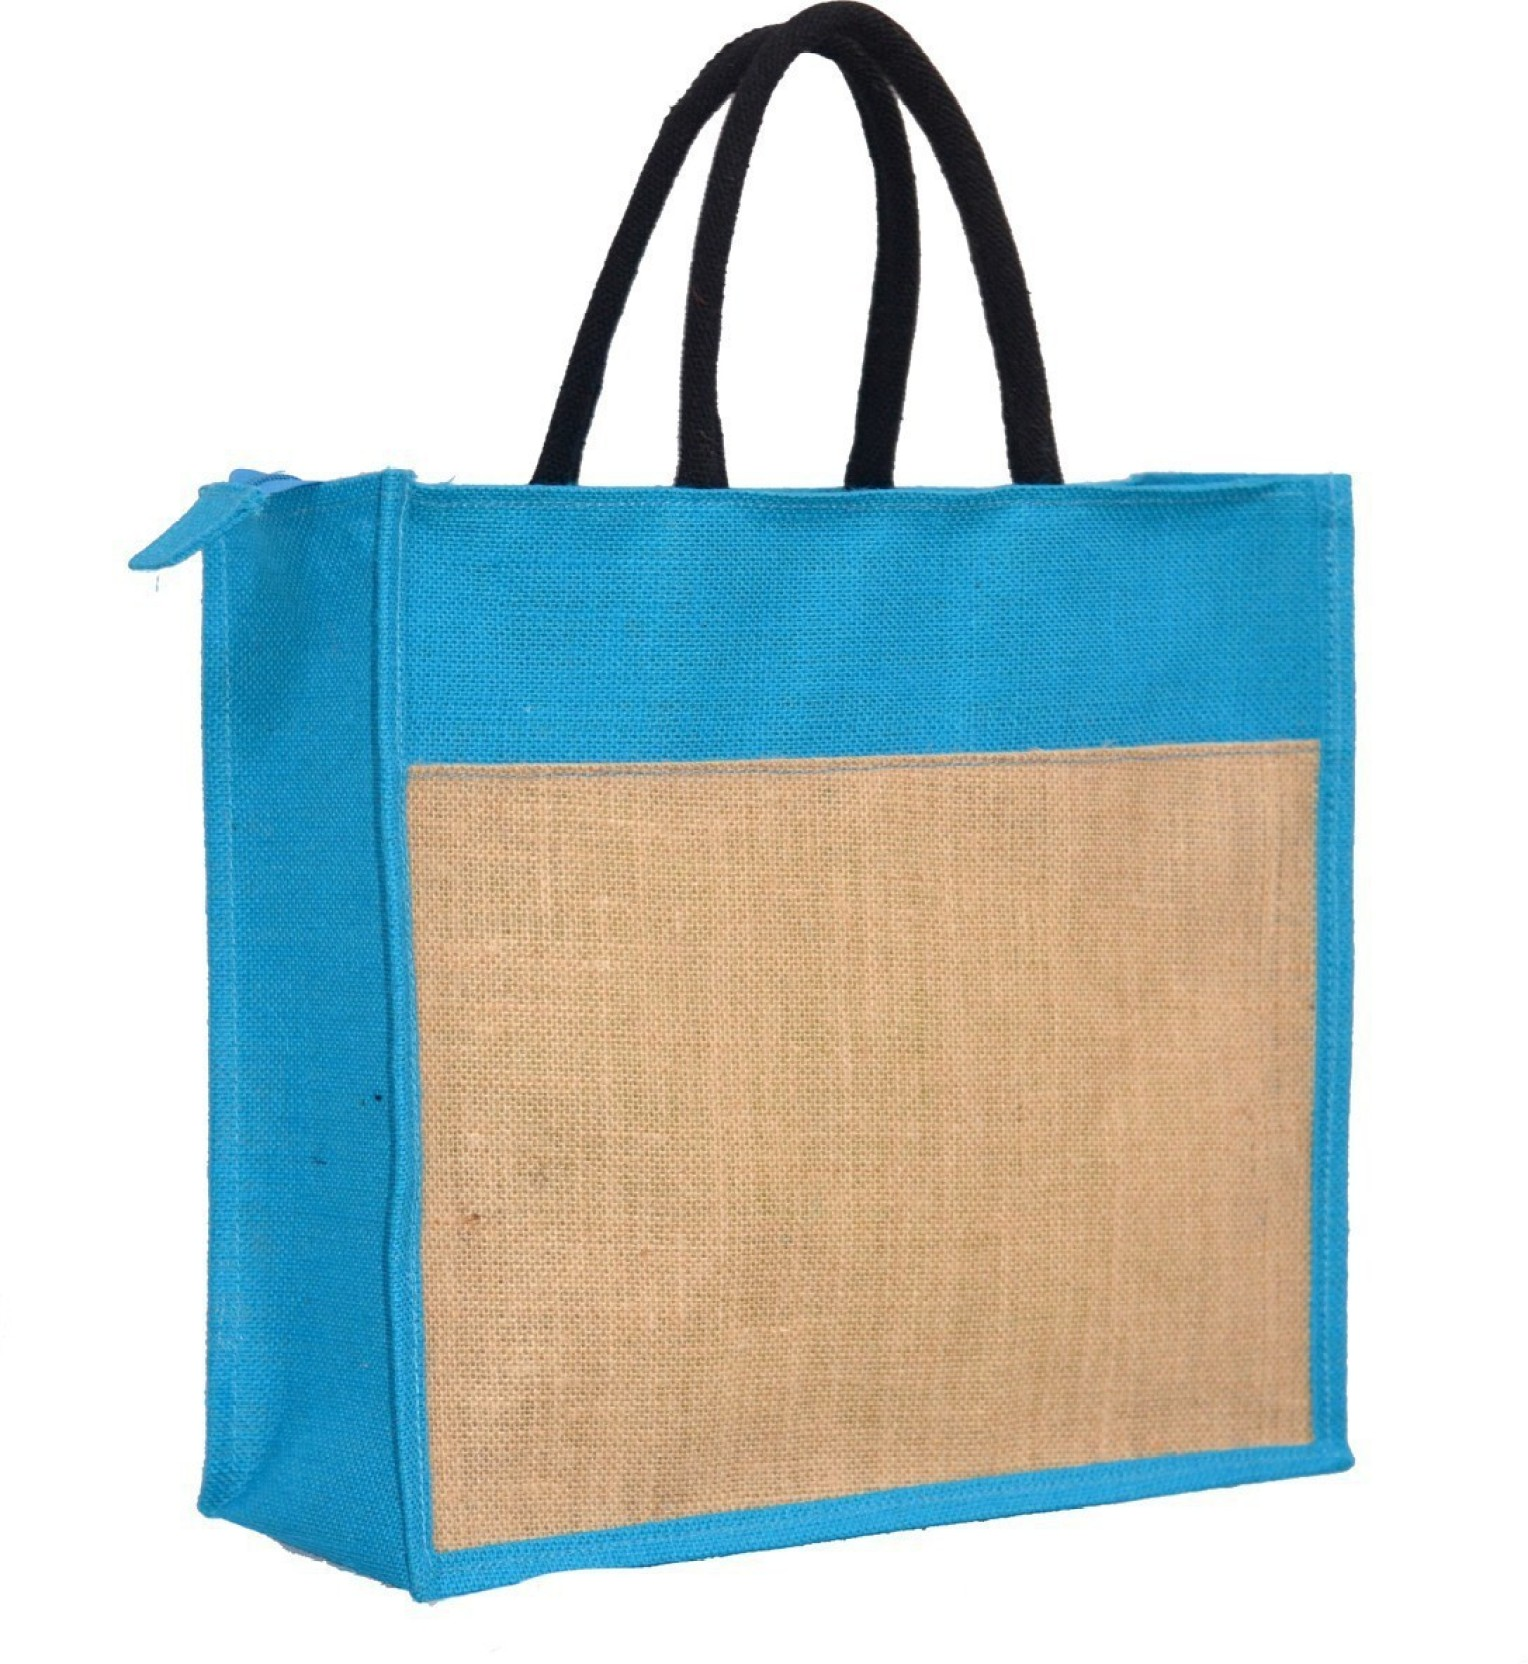 e3b741c1fd03 Flipkart.com   AGGDA Plain Jute Burlap Large Size handbag Bag ...